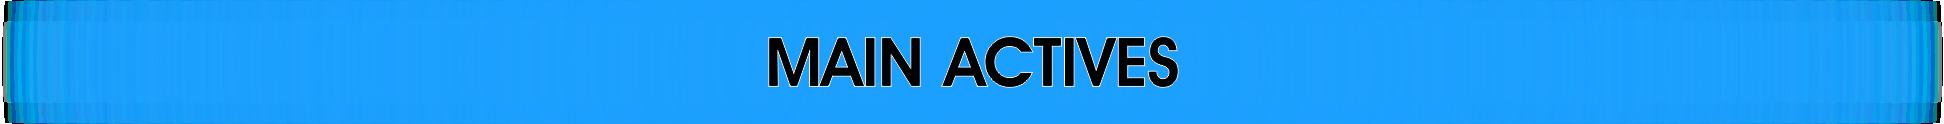 Main Actives Banner - 3.5.2016